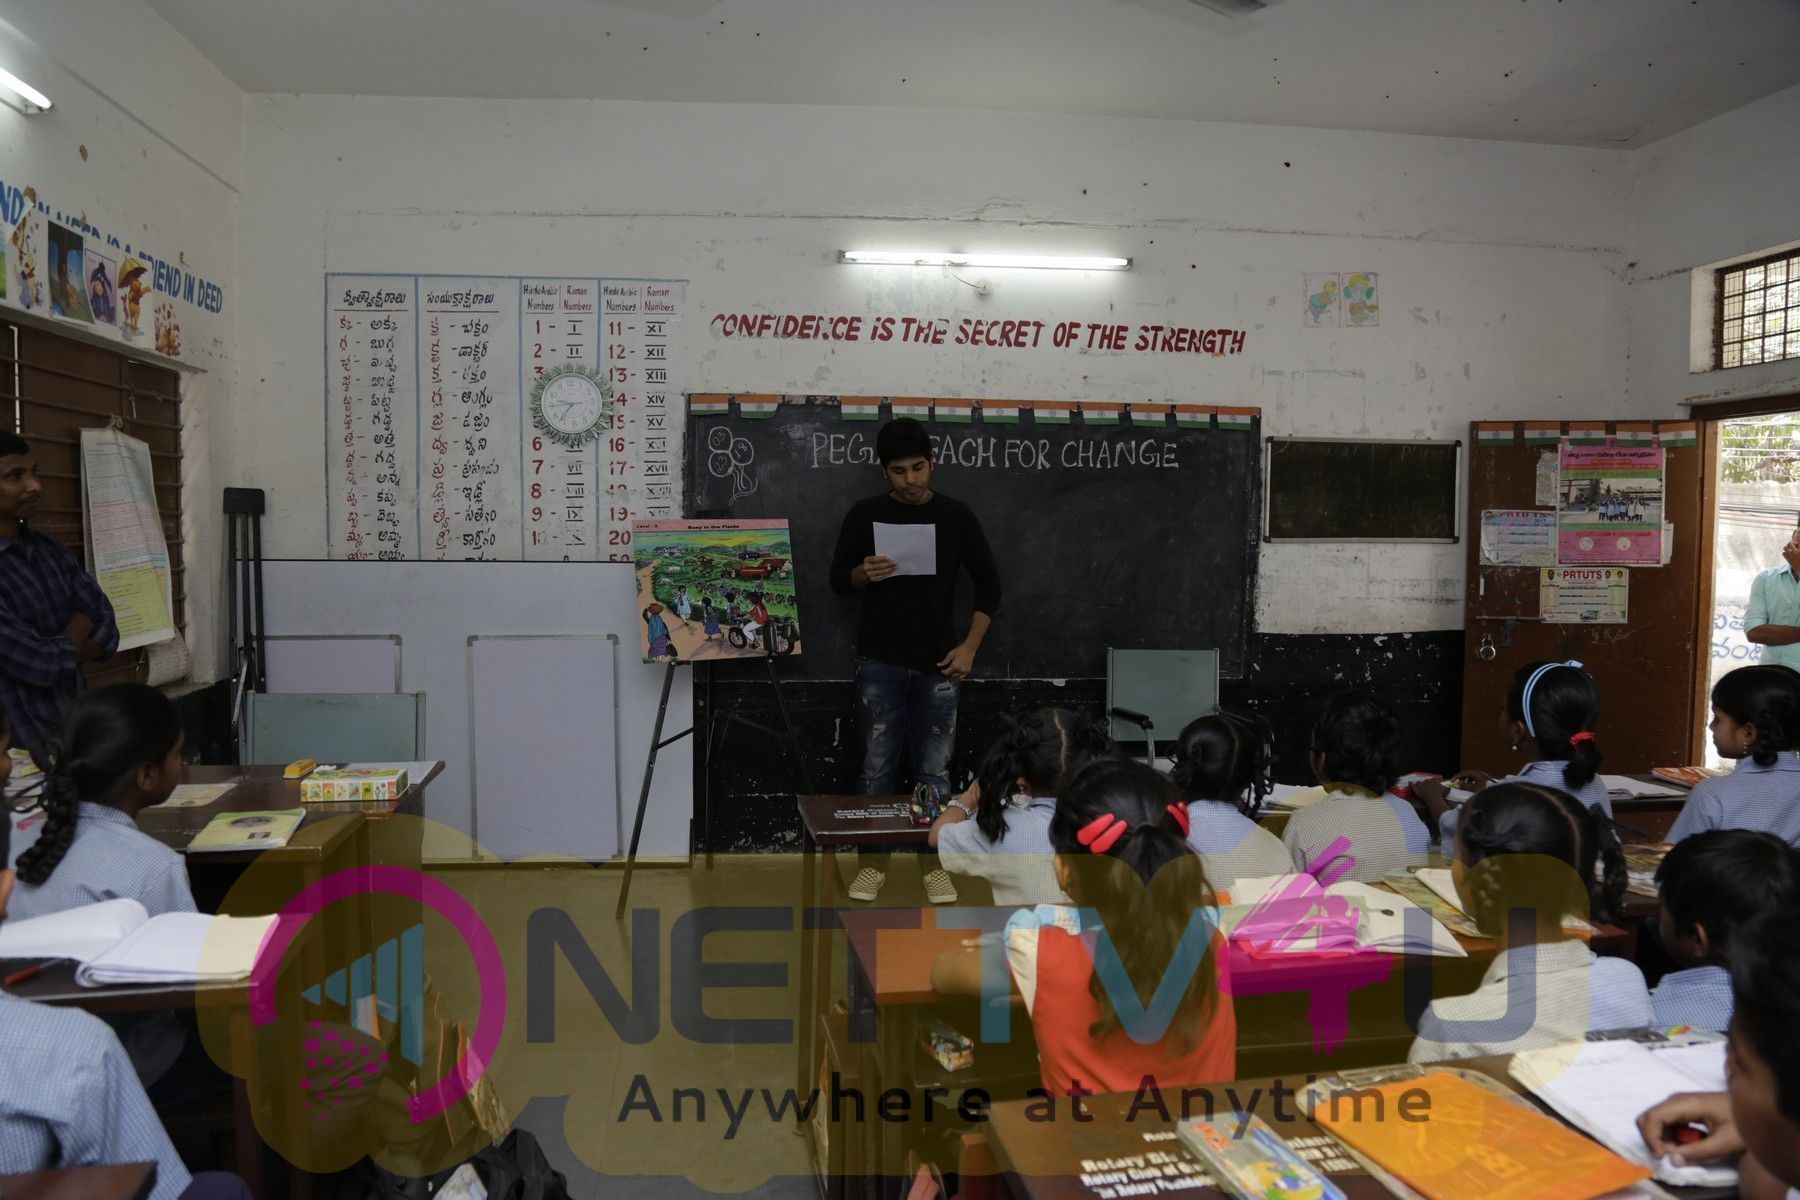 Allu Sirish Teaches English To Kids Supported Under Pega Teach For Change Initiative